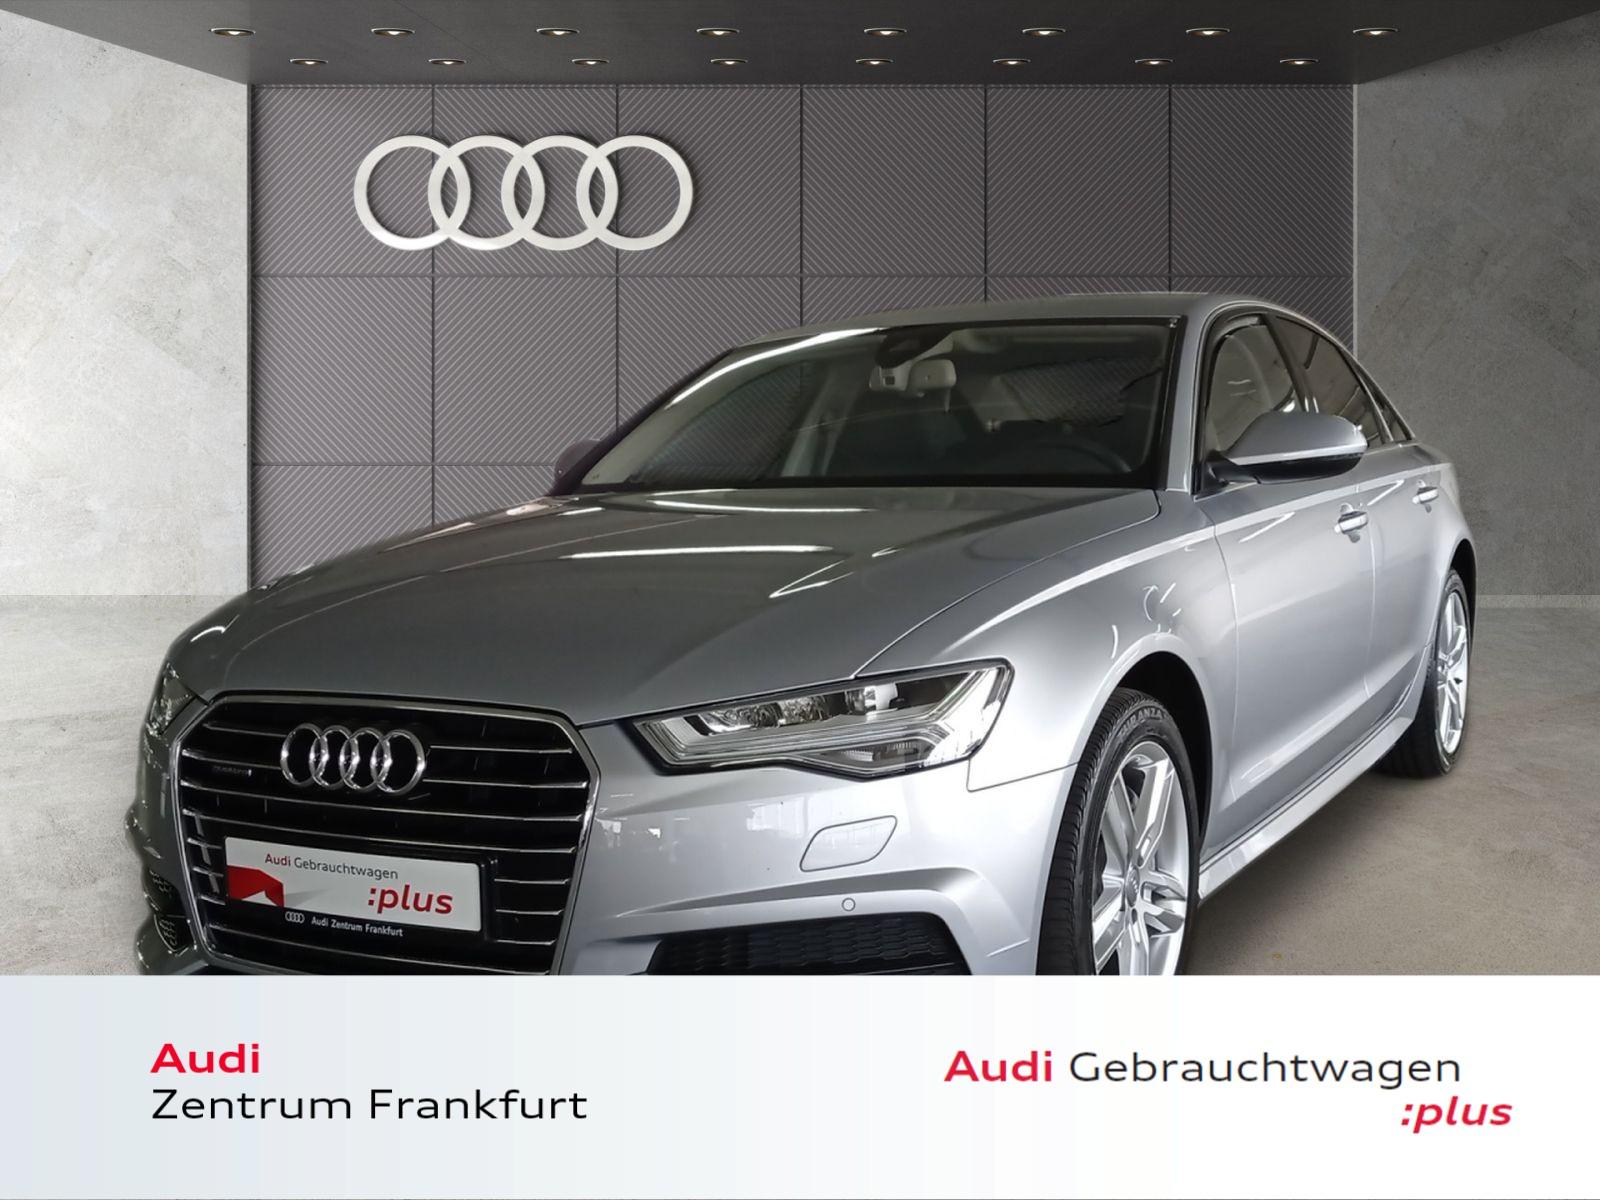 Audi A6 3.0 TDI quattro S tronic LED Navi Tempomat, Jahr 2017, Diesel